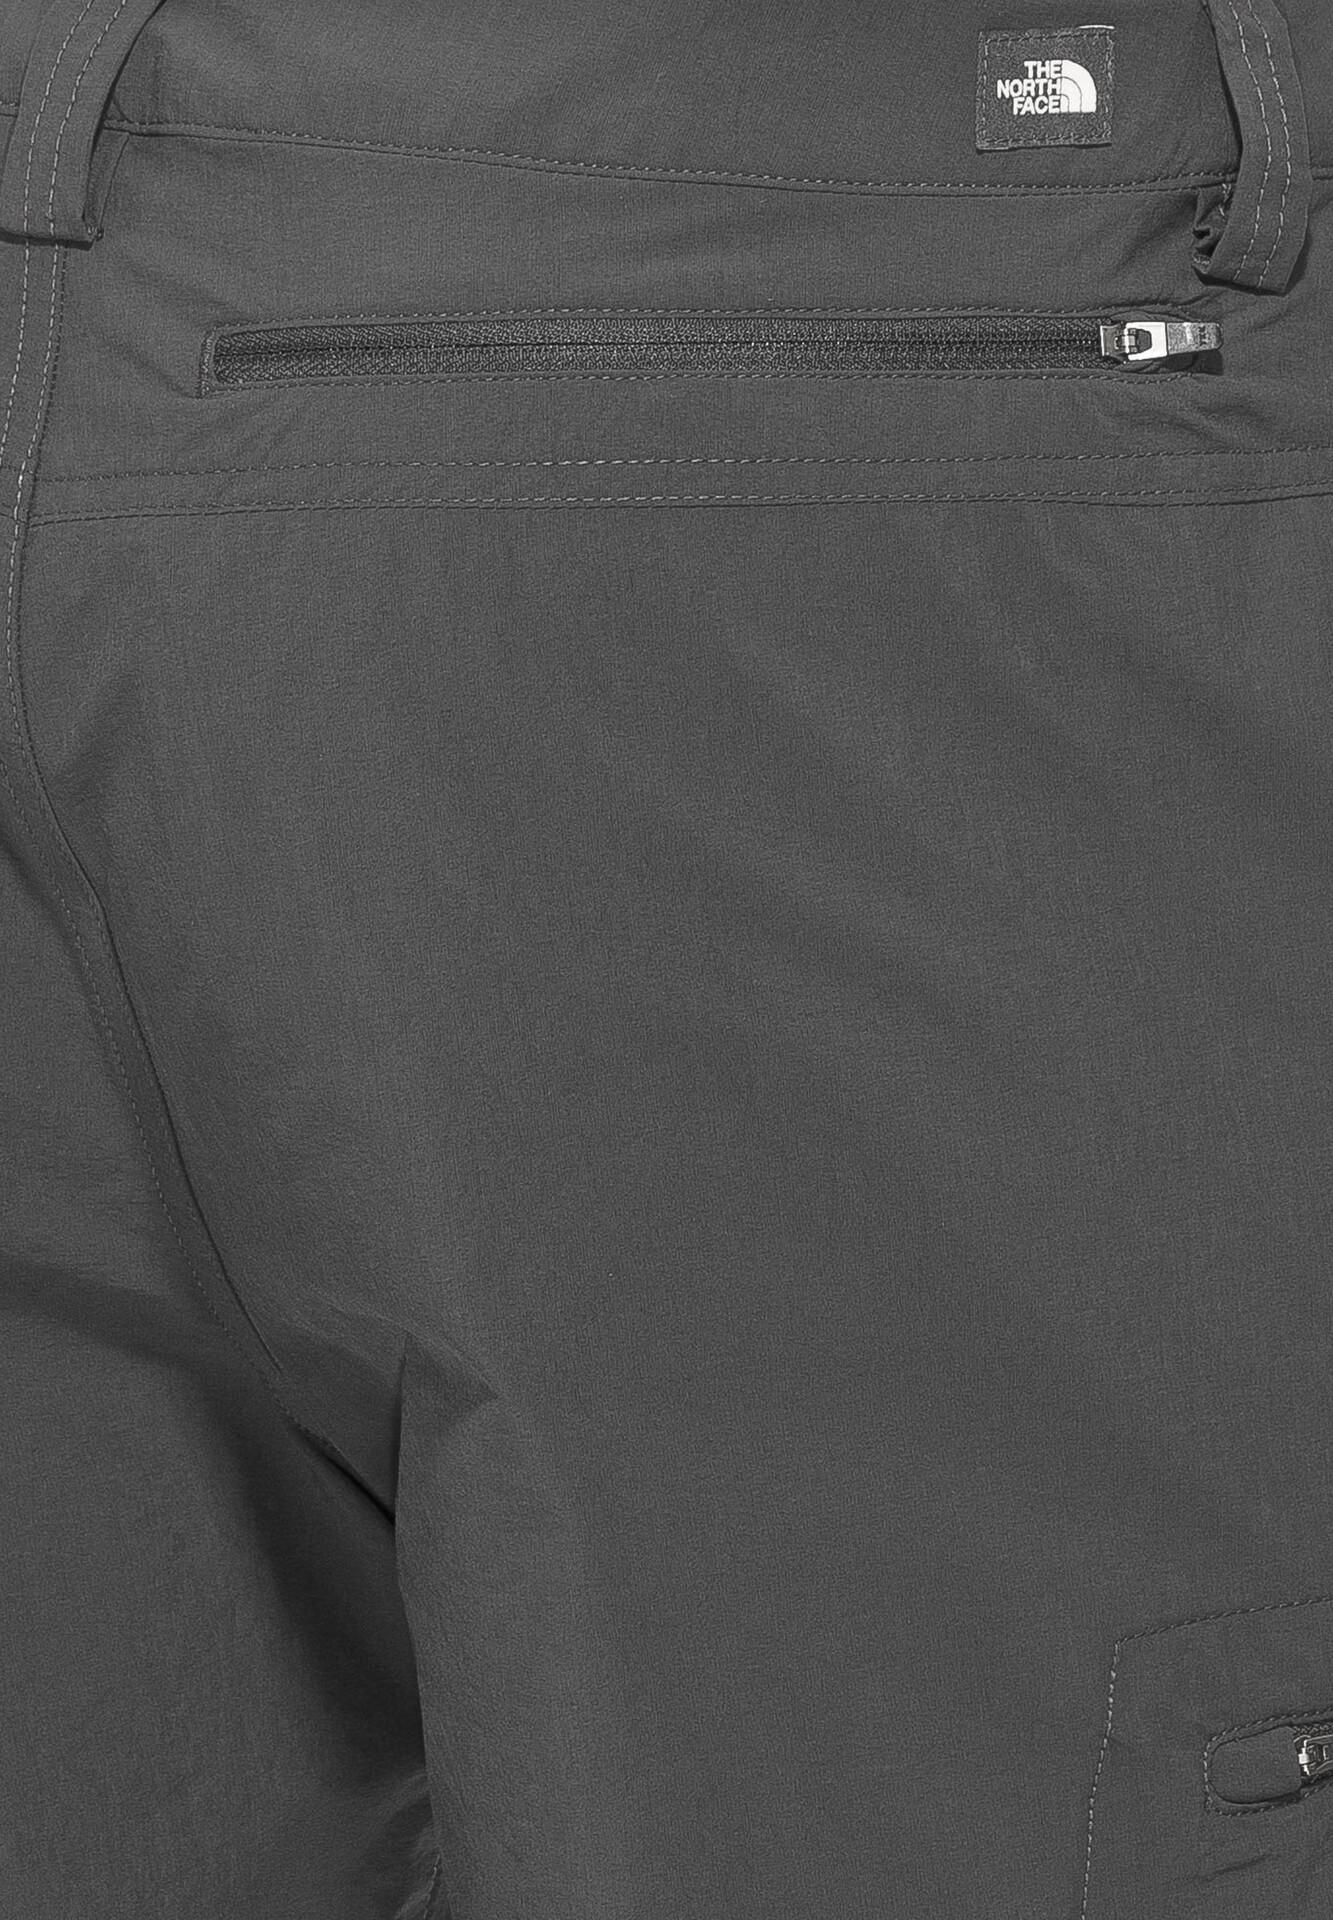 Fermeture Long Pantalon Grey Face HommeAsphalt North Avec The Convertible Exploration Éclair WDI29HEY